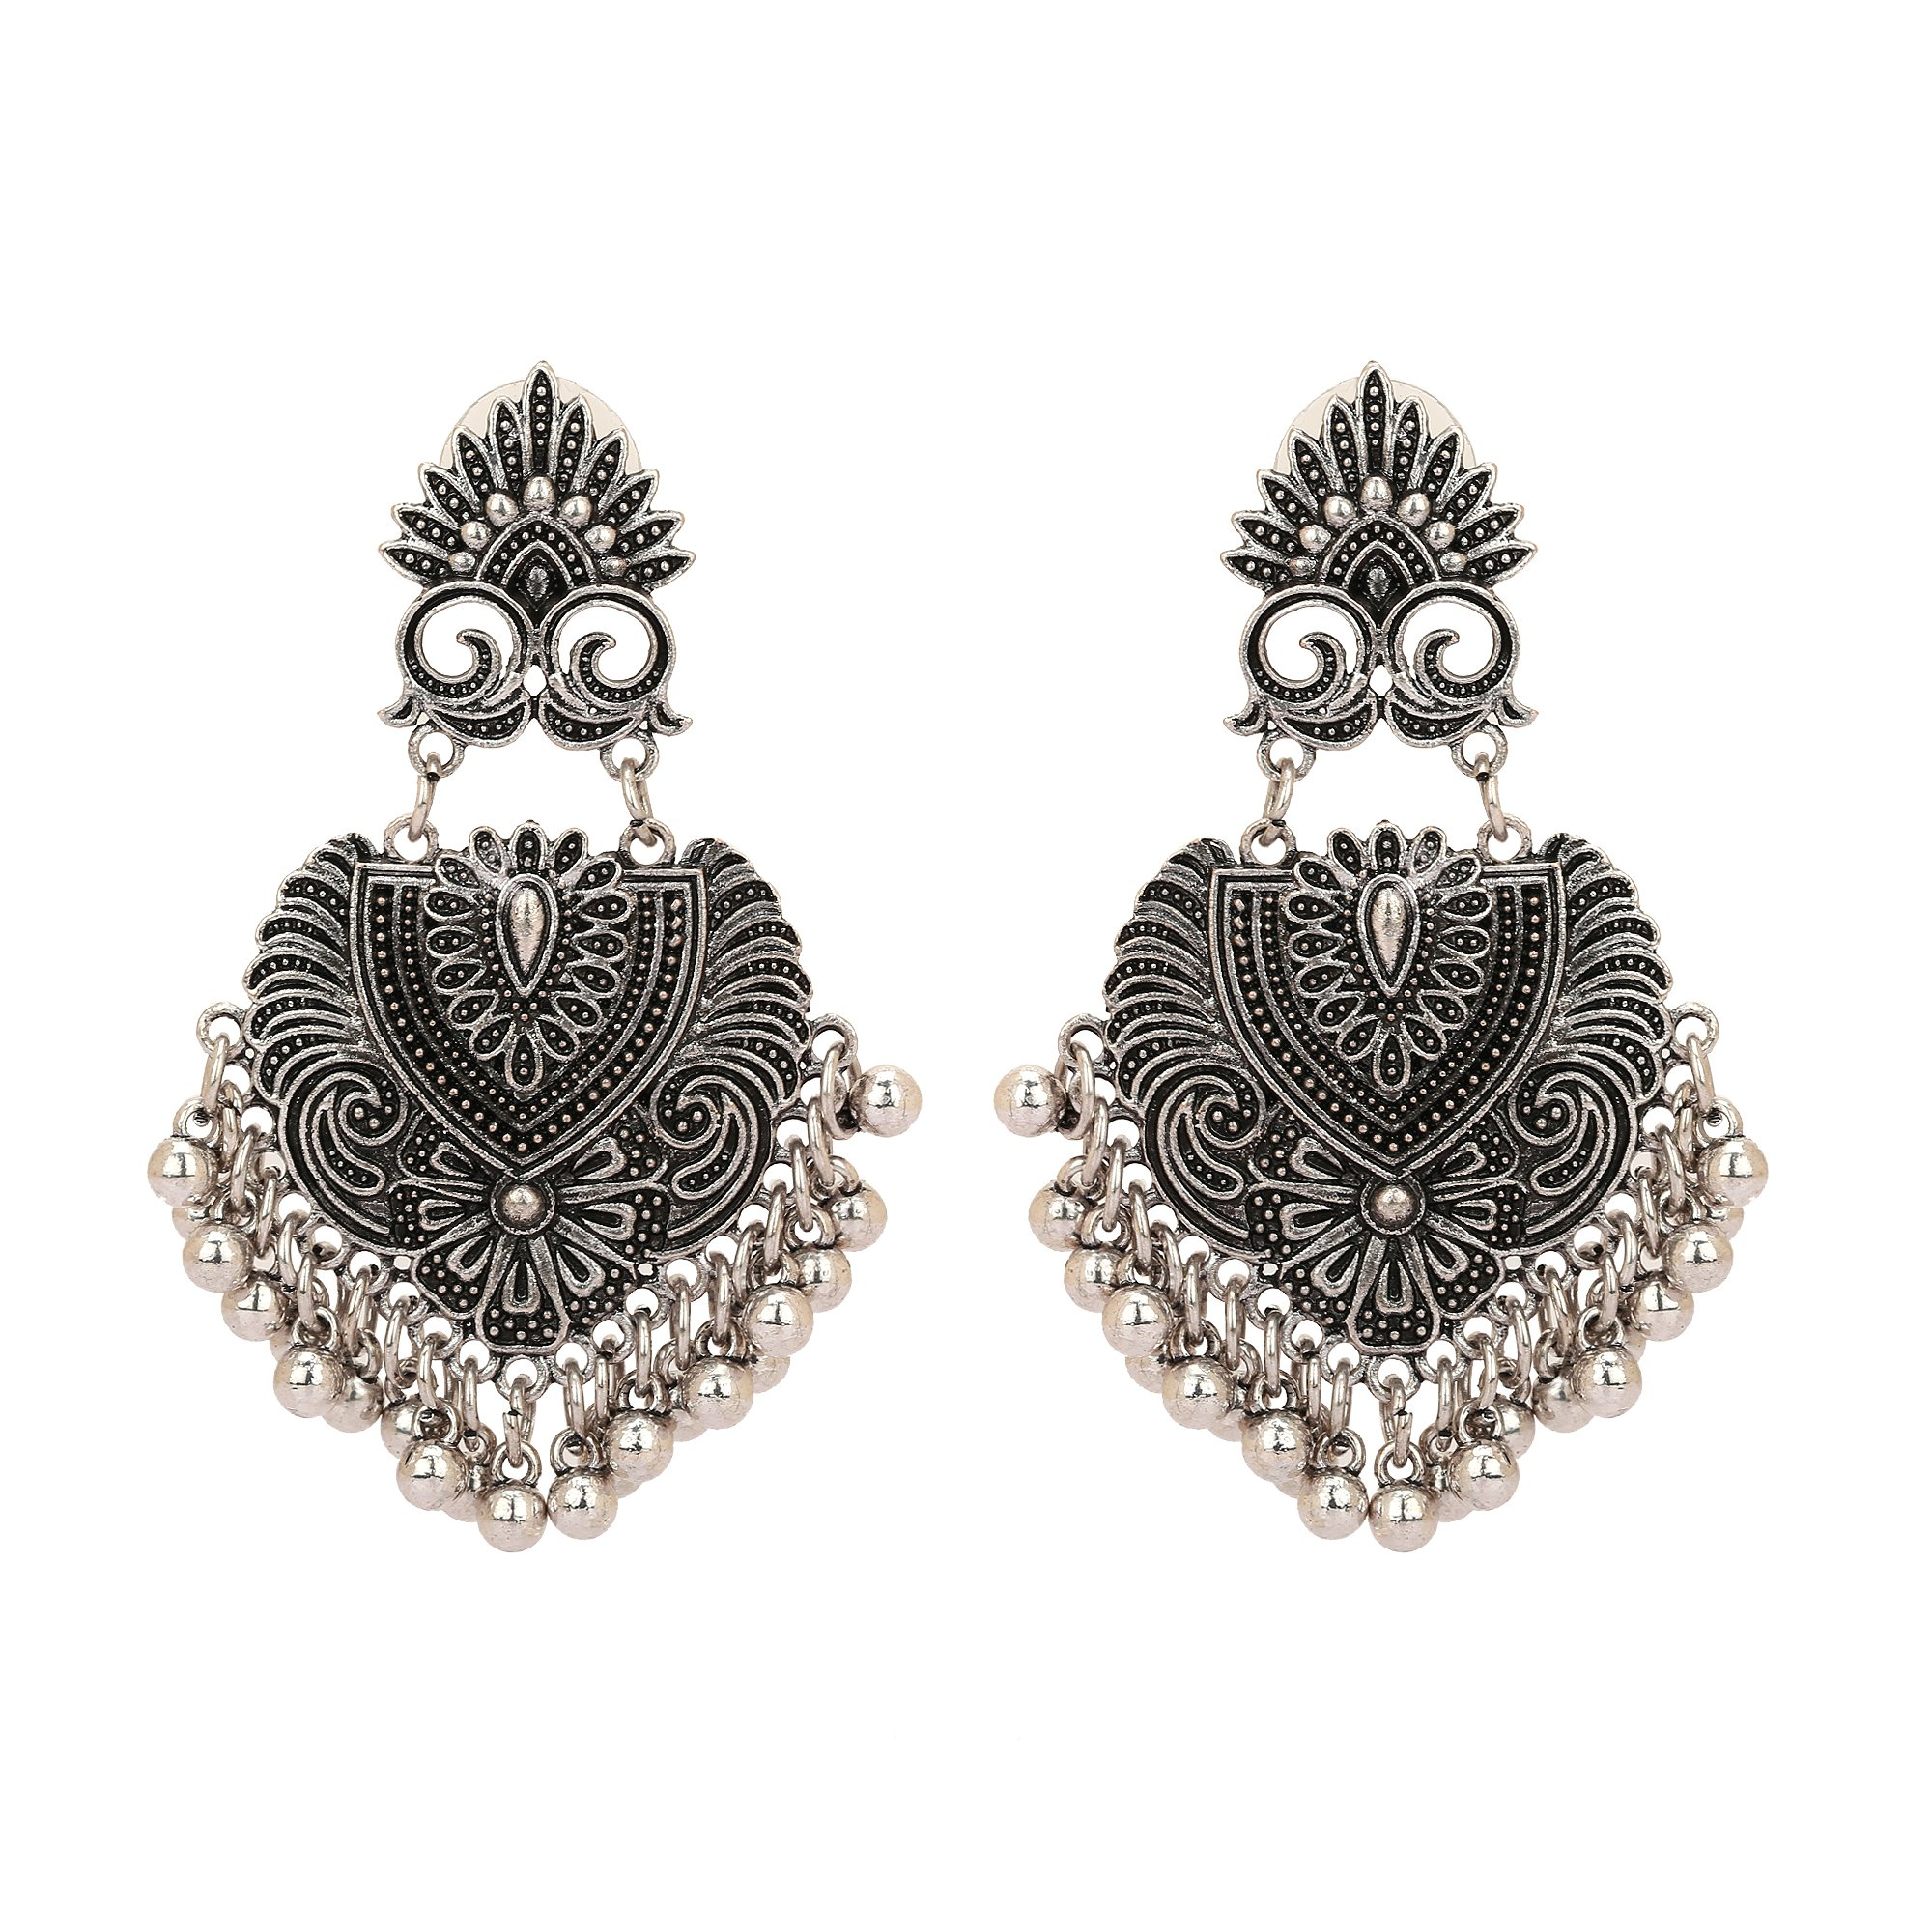 Jwellmart Afghani Bohemian Tribal Style Oxidized Drop Dangle Indian Earrings for Women and Girls (Silver)